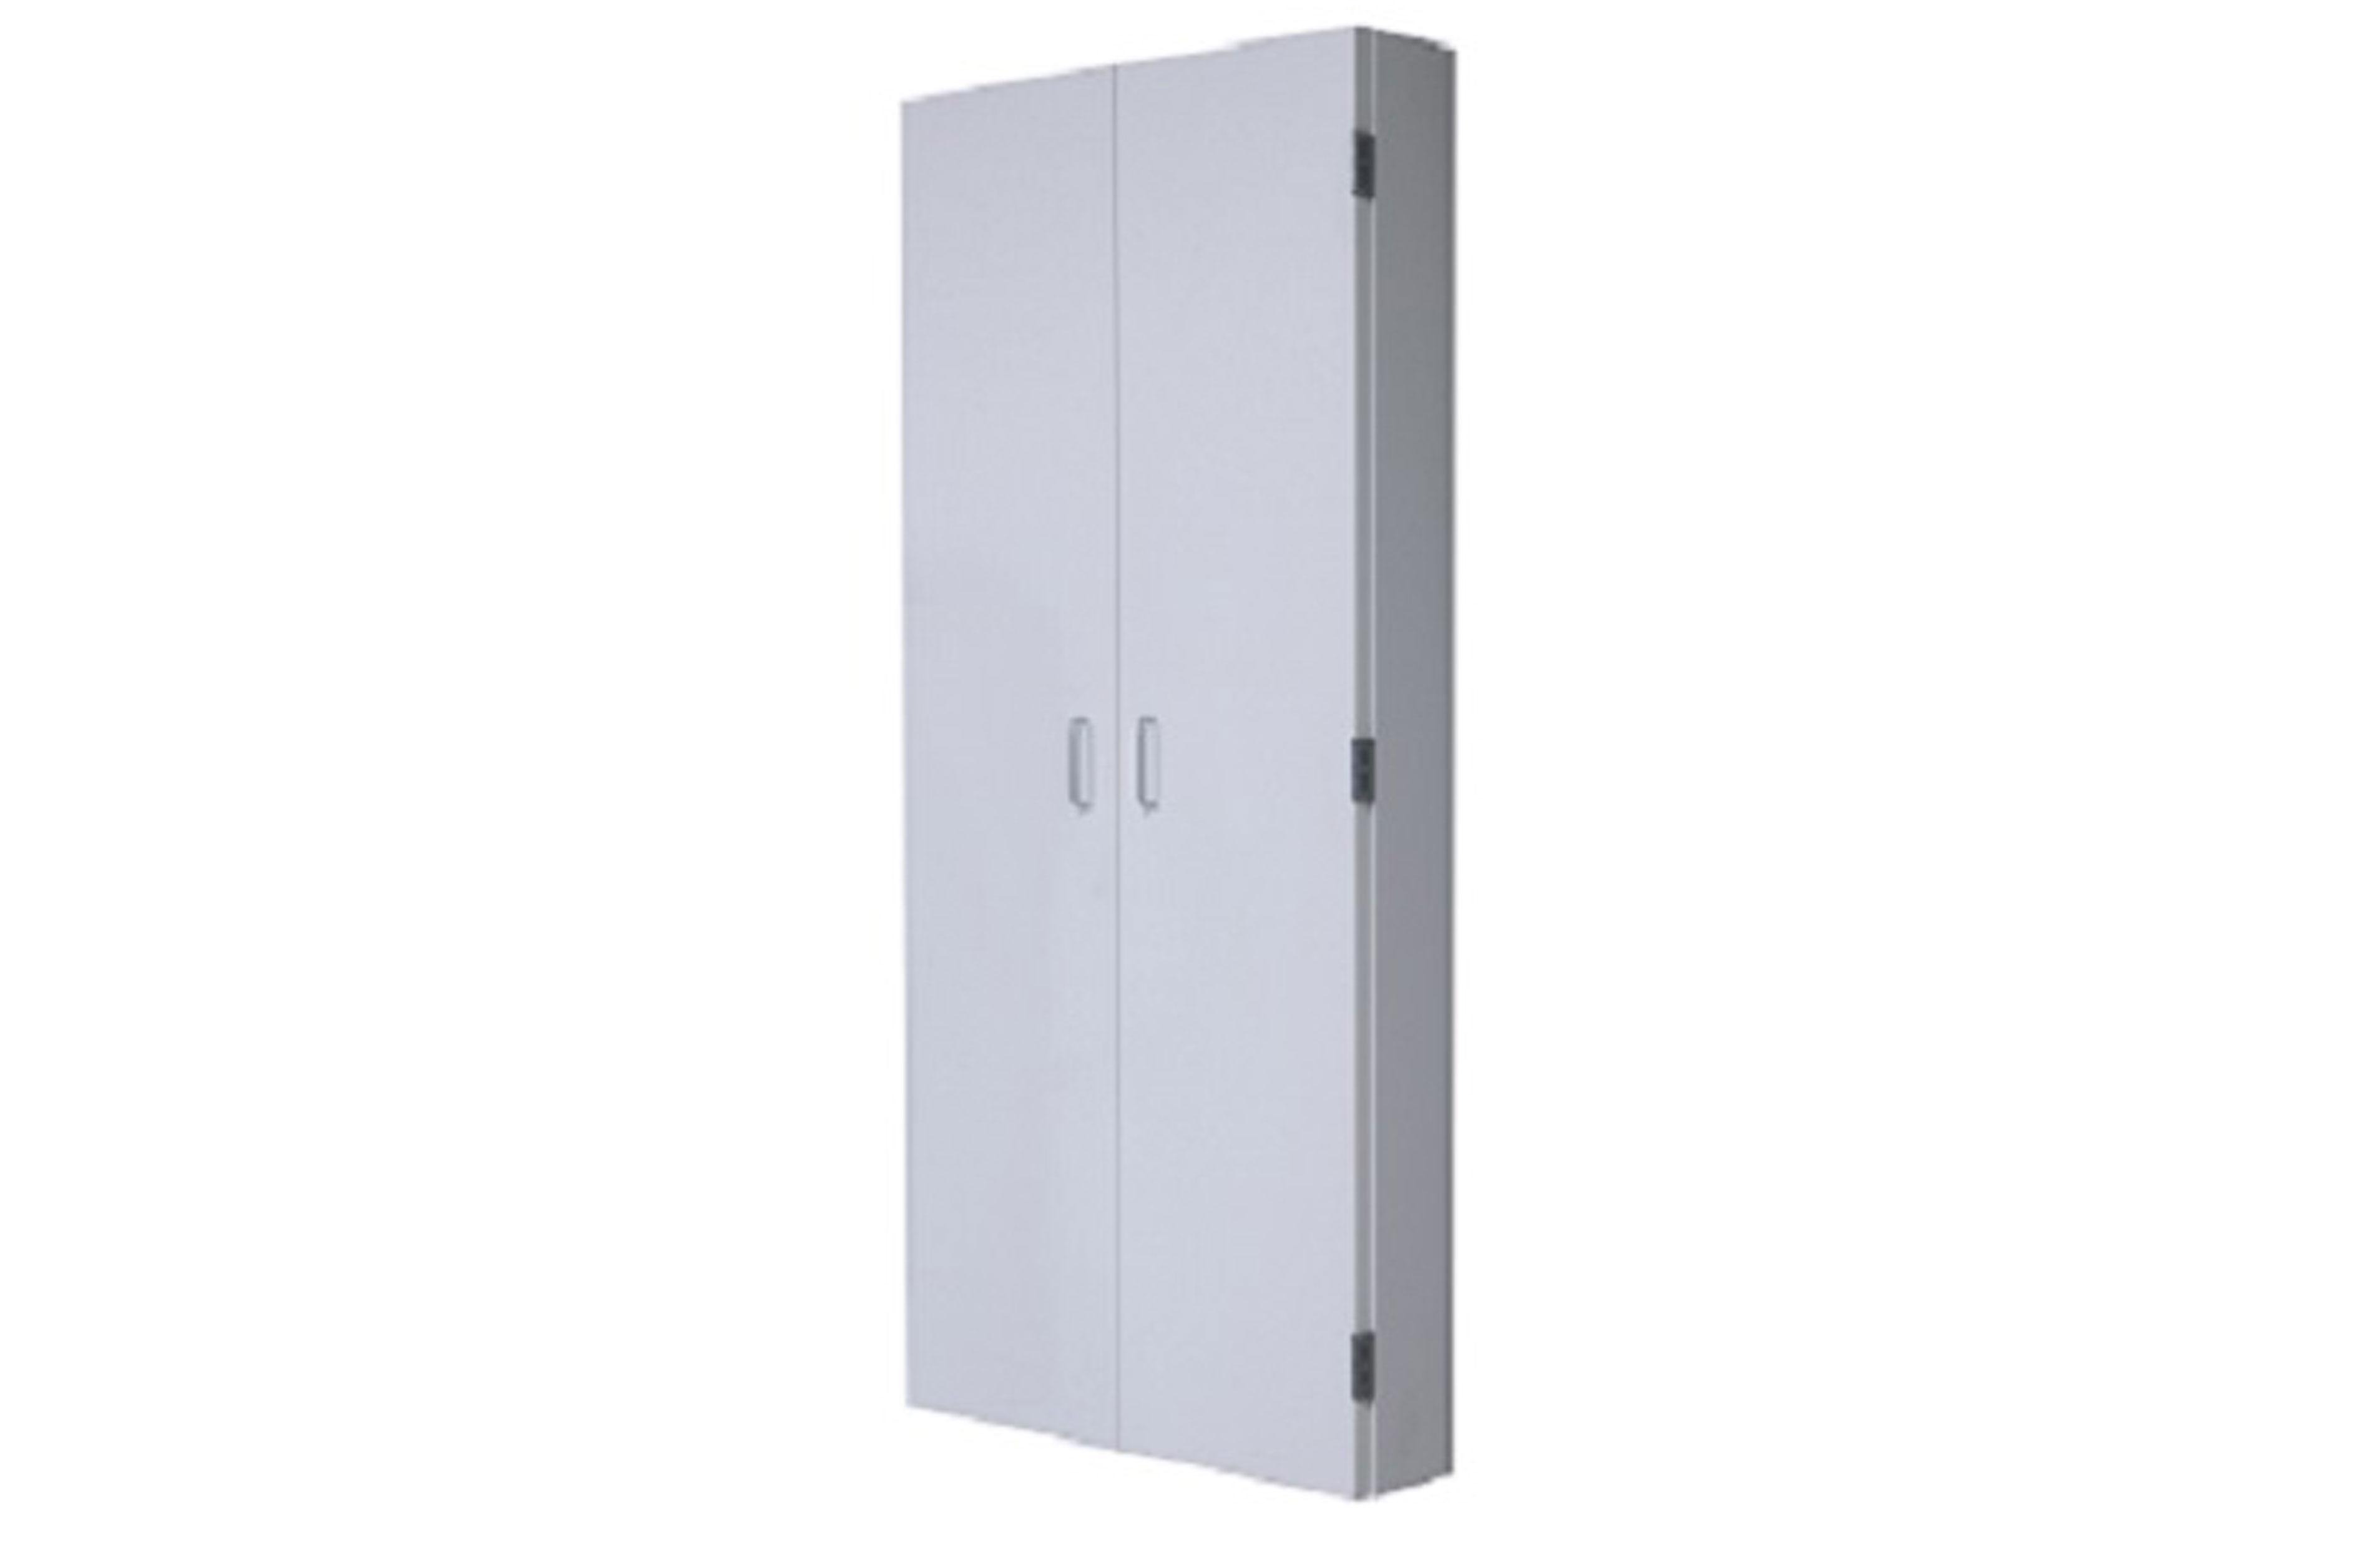 Folding-Wall-Mount-Cabinet